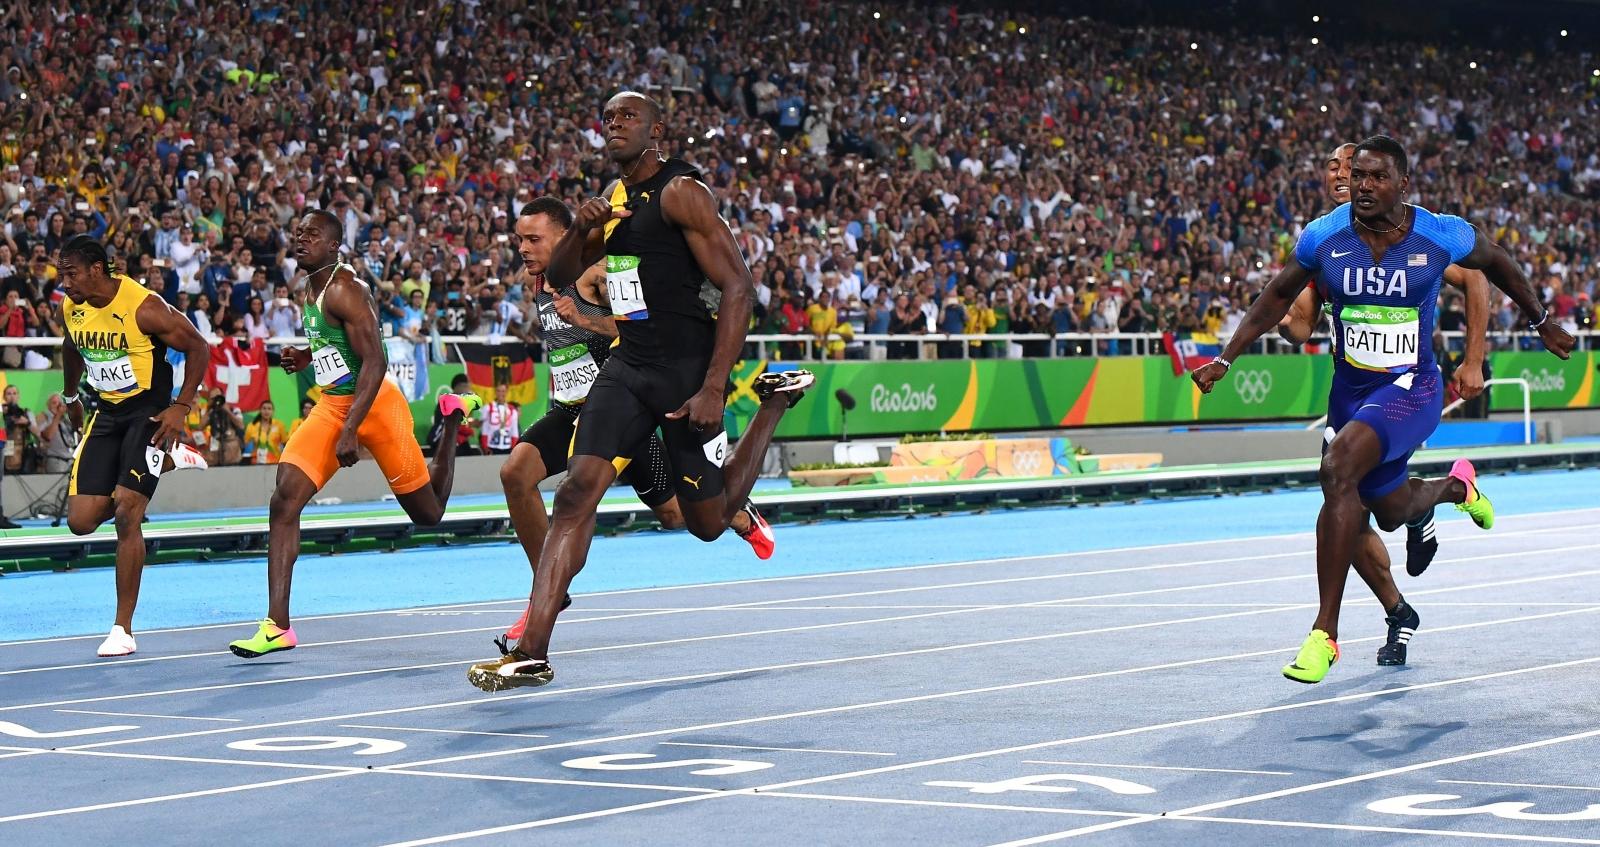 Rio 2016 Olympics: Usain Bolt wis historic third gold ...